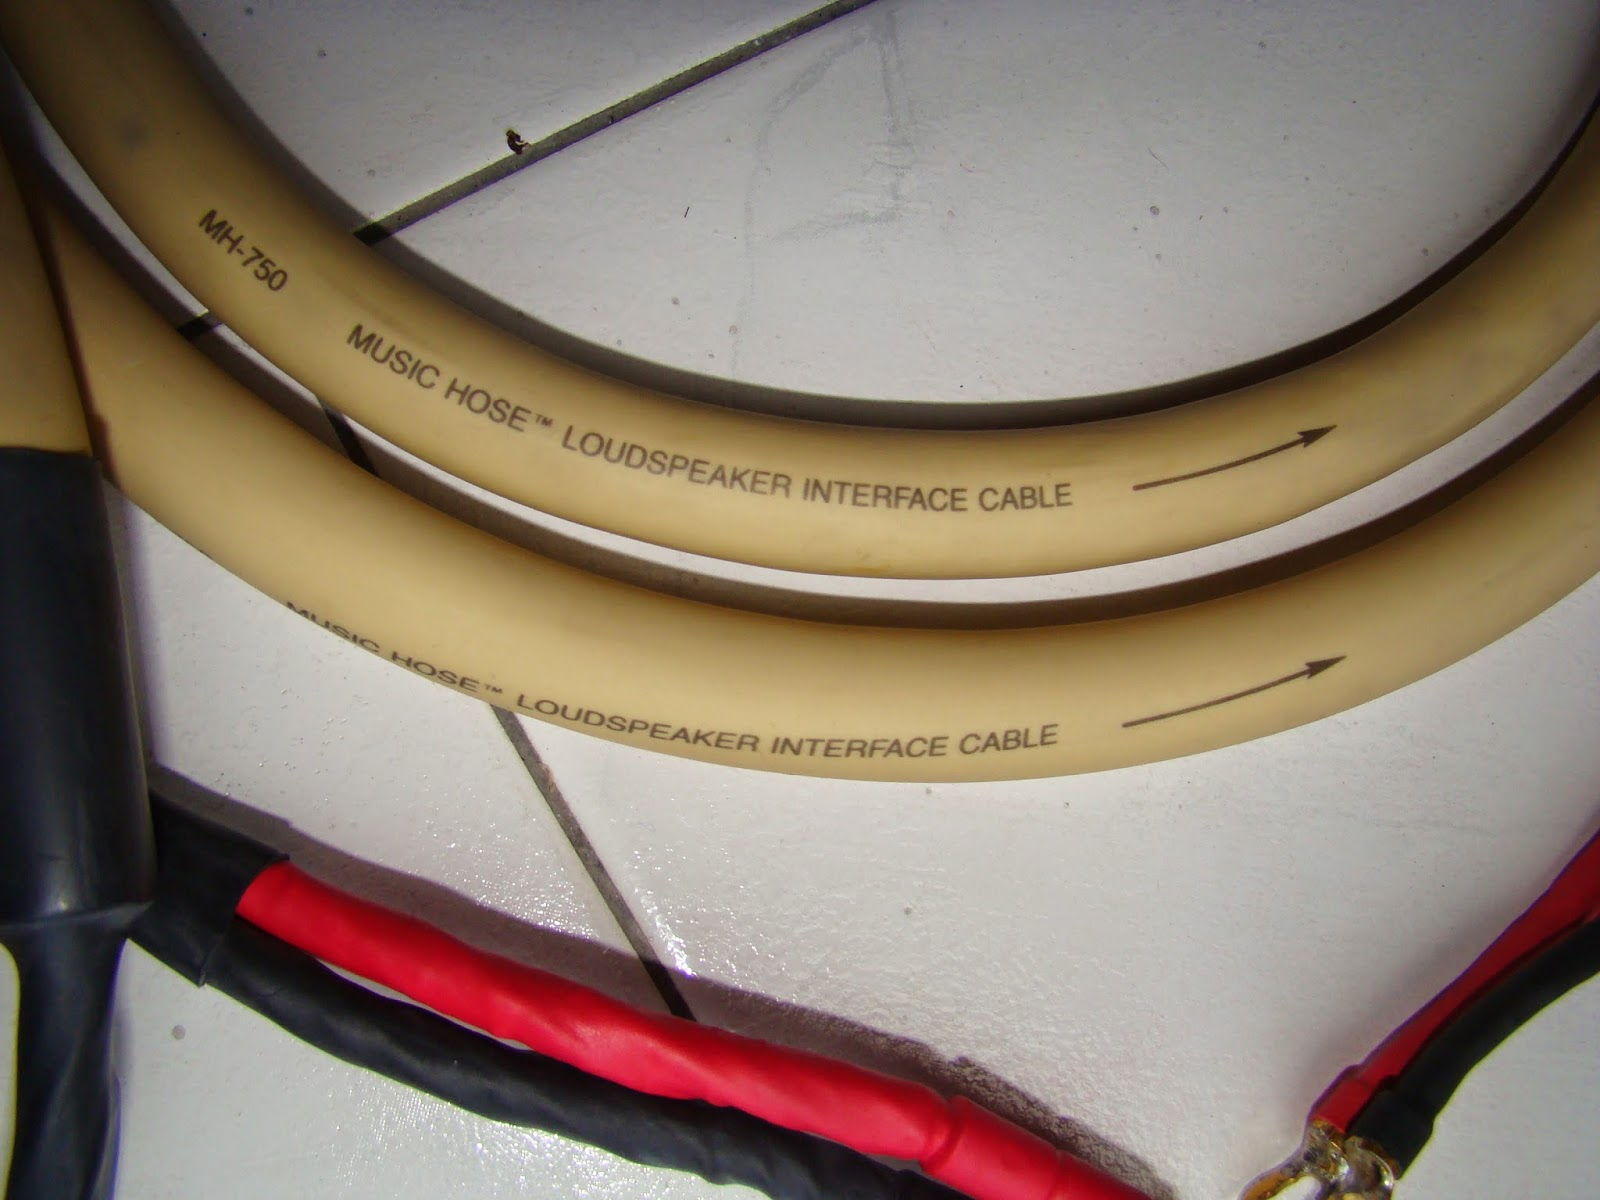 music hose